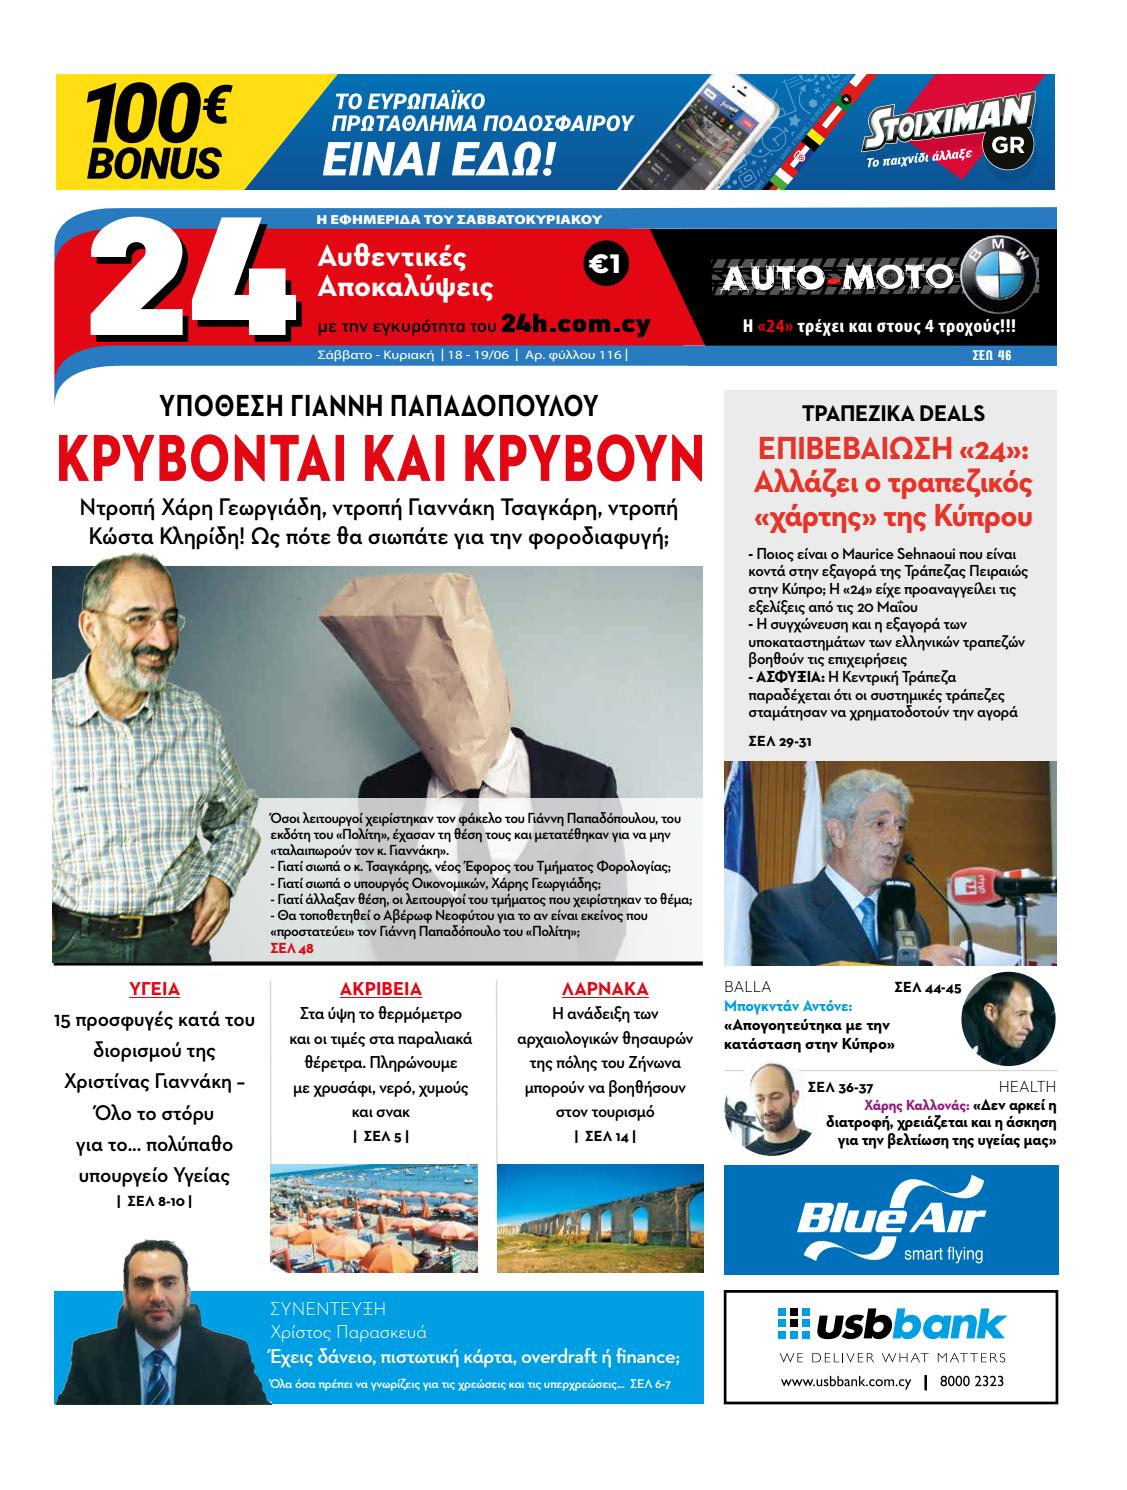 8008bdd960f Εφημερίδα 24 - Φύλλο 116 - 18 Ιουνίου 2016 by Newspaper 24 - issuu